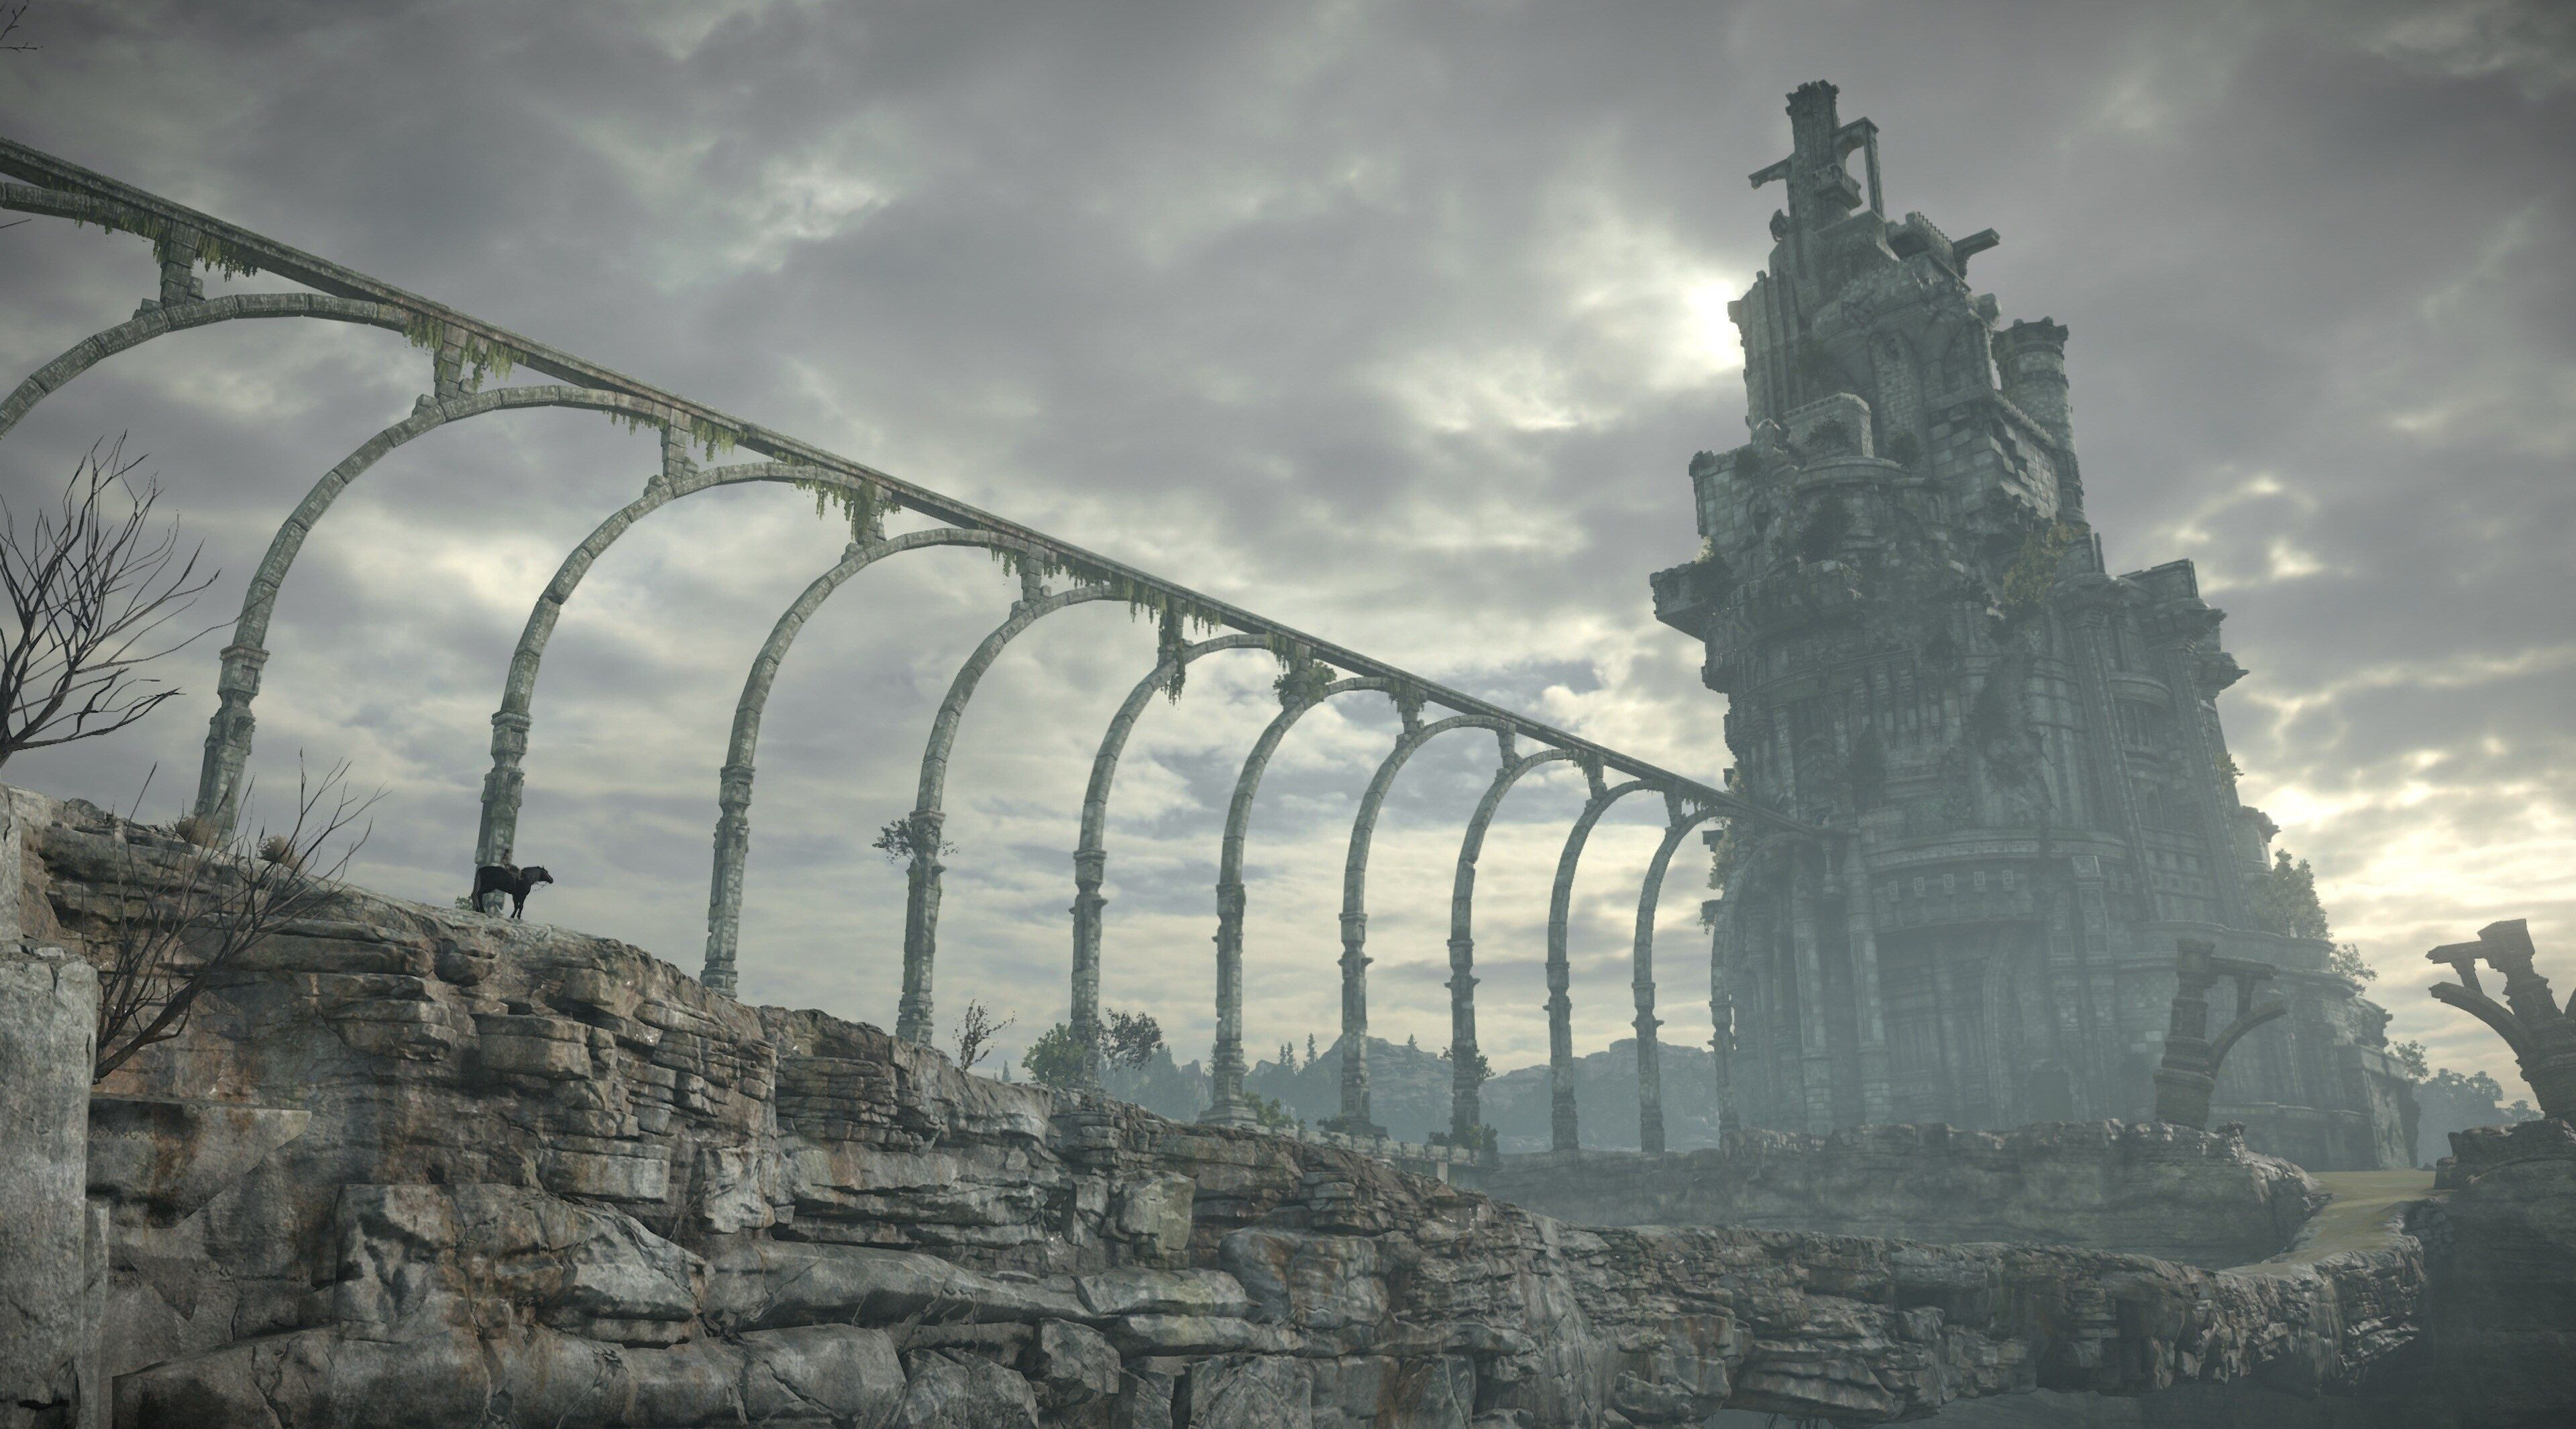 3840x2130 Shadow Of The Colossus 4k Screensaver Wallpaper Hd